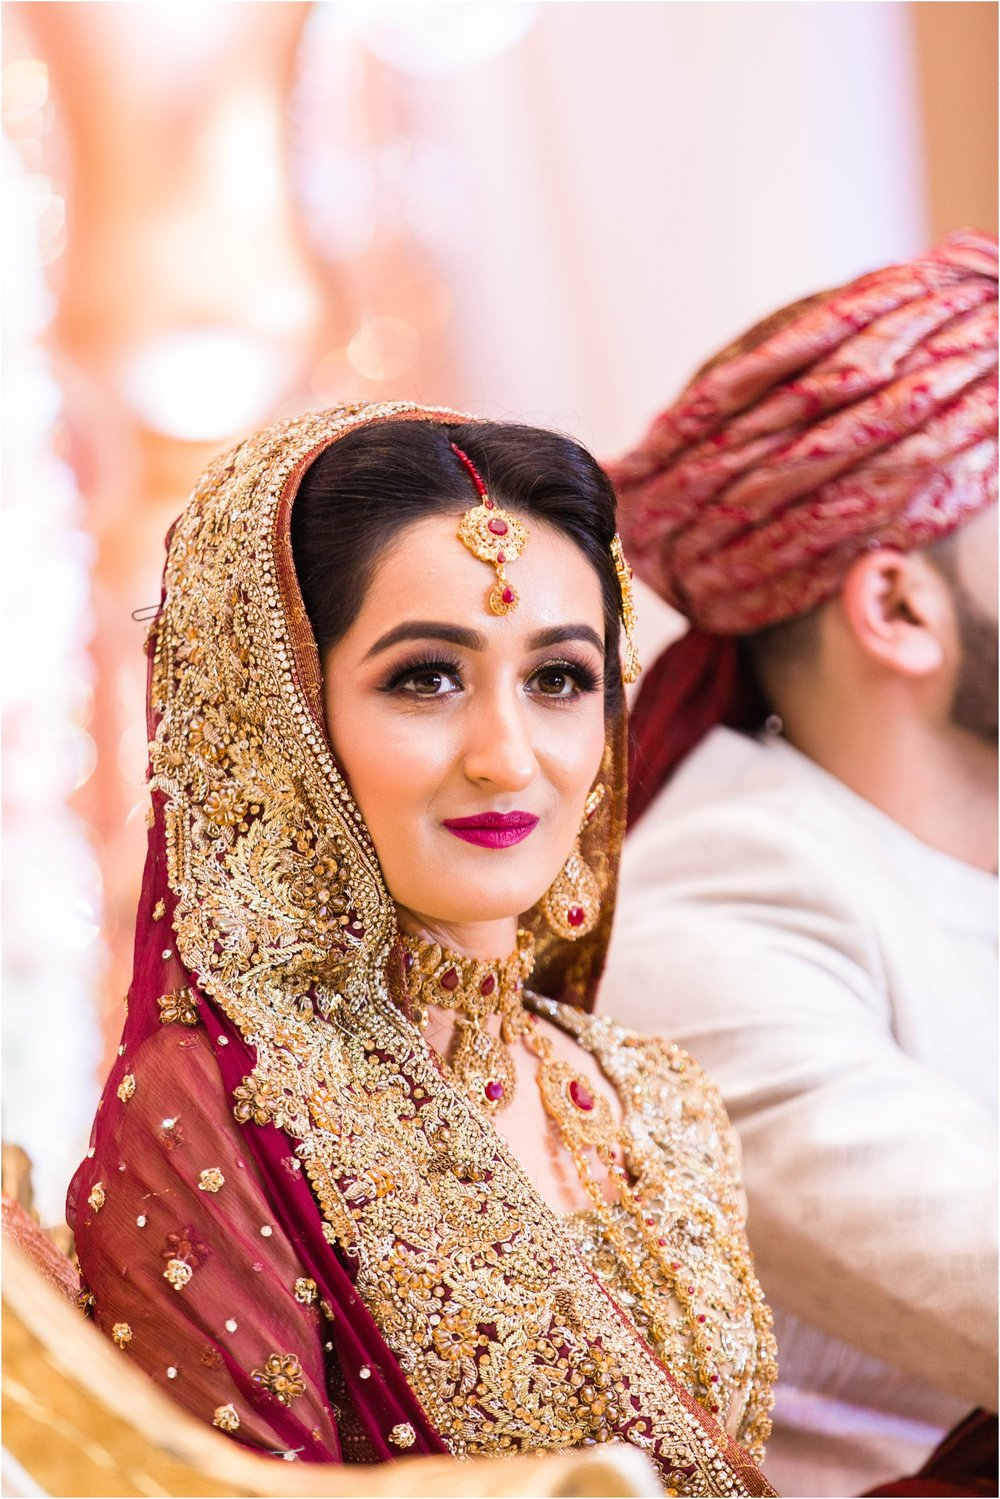 Scarborough-Convention-Centre-Baraat-Toronto-Mississauga-Brampton-Scarborough-GTA-Pakistani-Indian-Wedding-Engagement-Photographer-Photography_0030.jpg